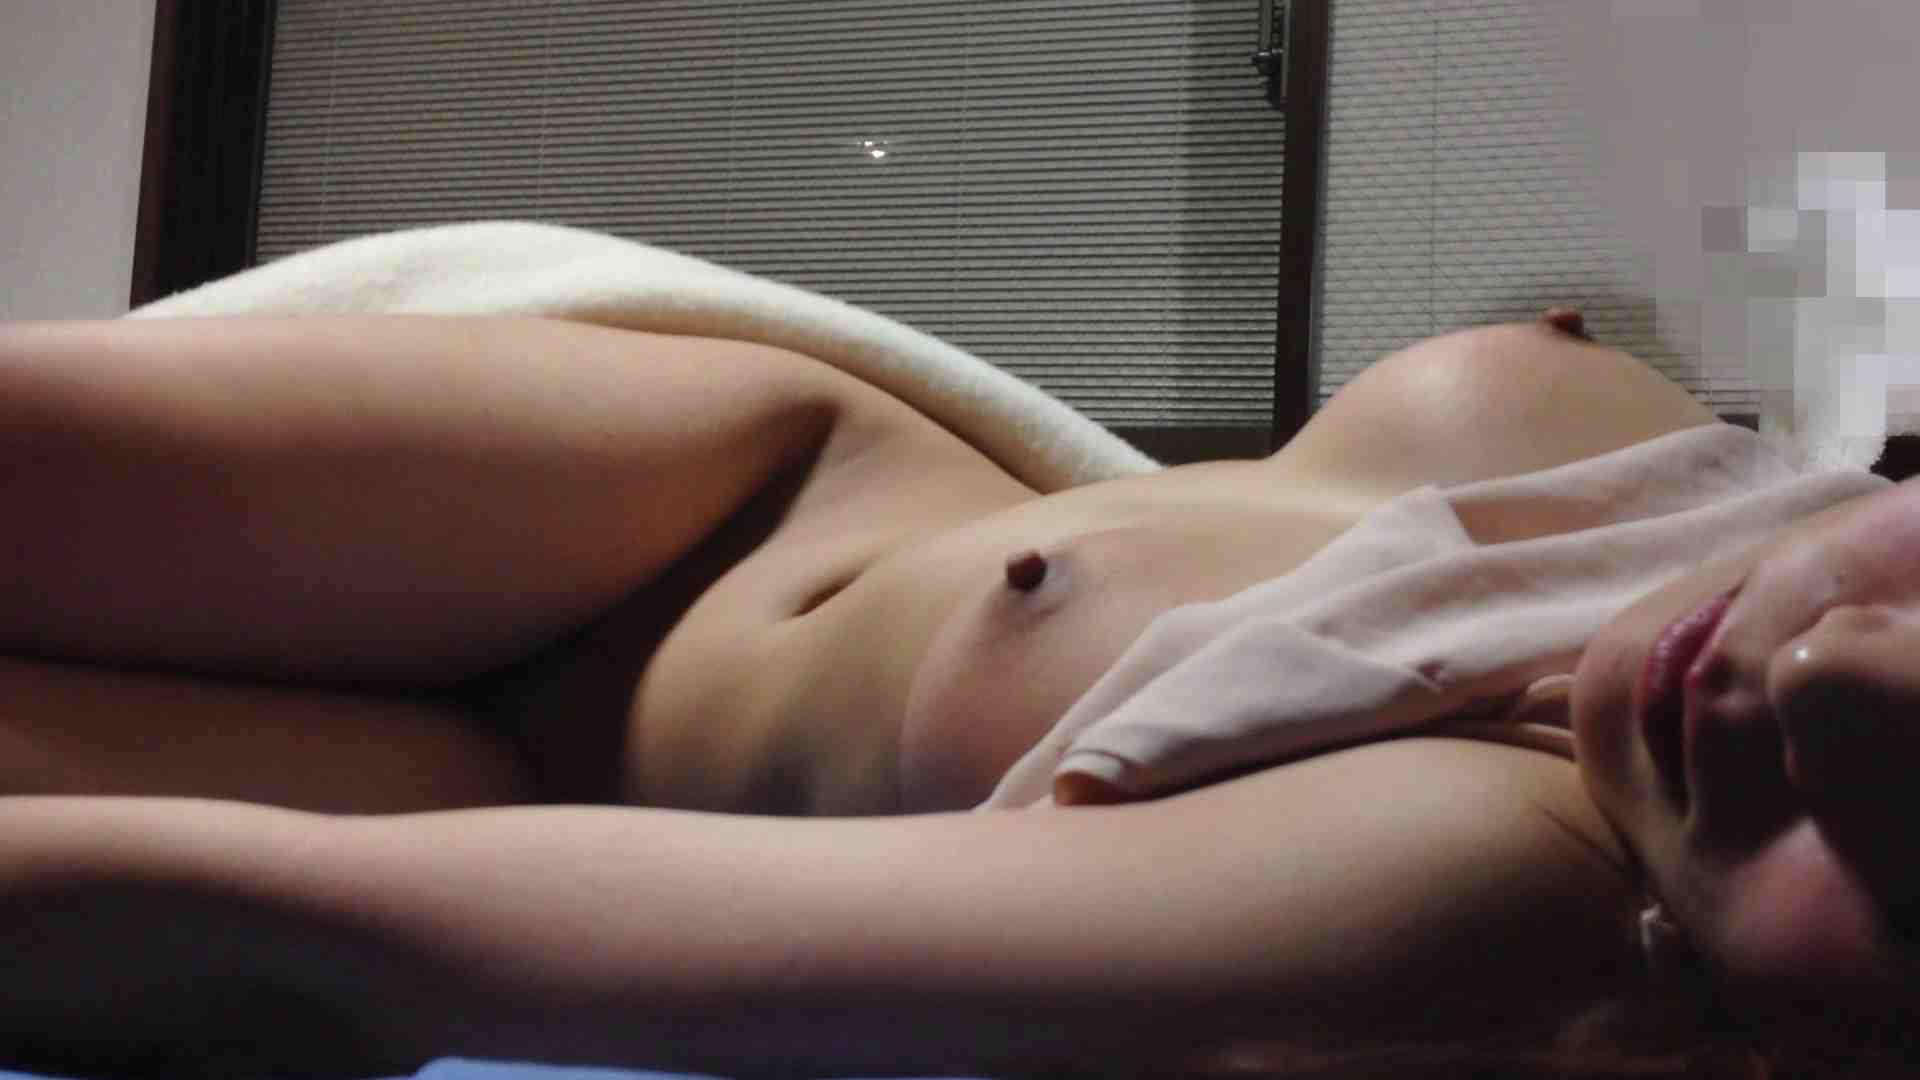 Vol.01 長身スタイル抜群のSSS美女を・・・。 前編 友人 盗撮おめこ無修正動画無料 92PICs 79